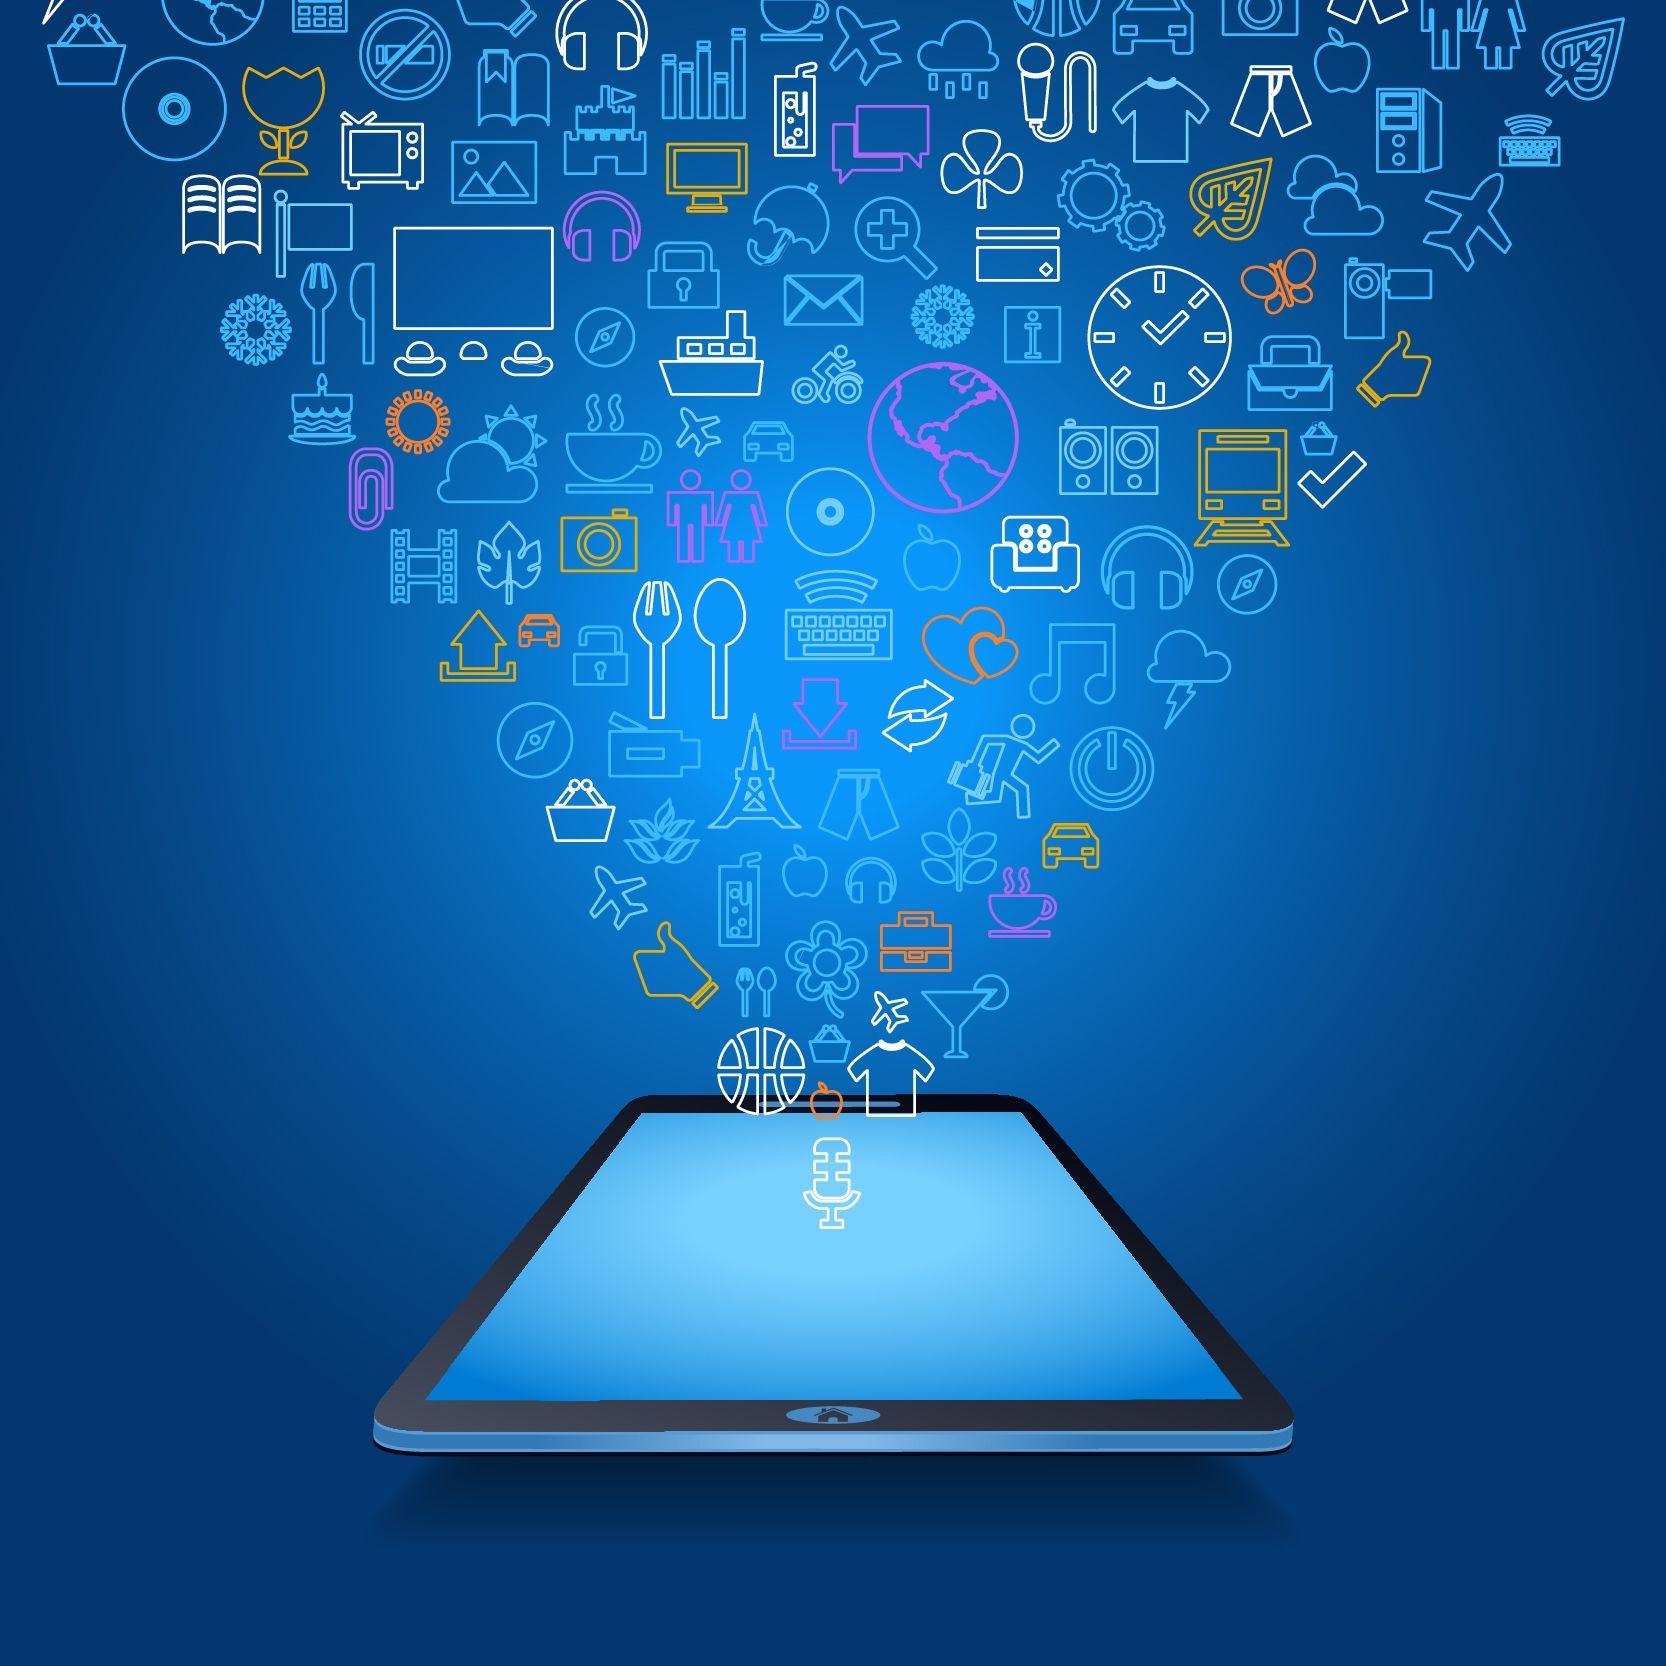 Mobile App In A Tablet. DigitalMarketing Design Web